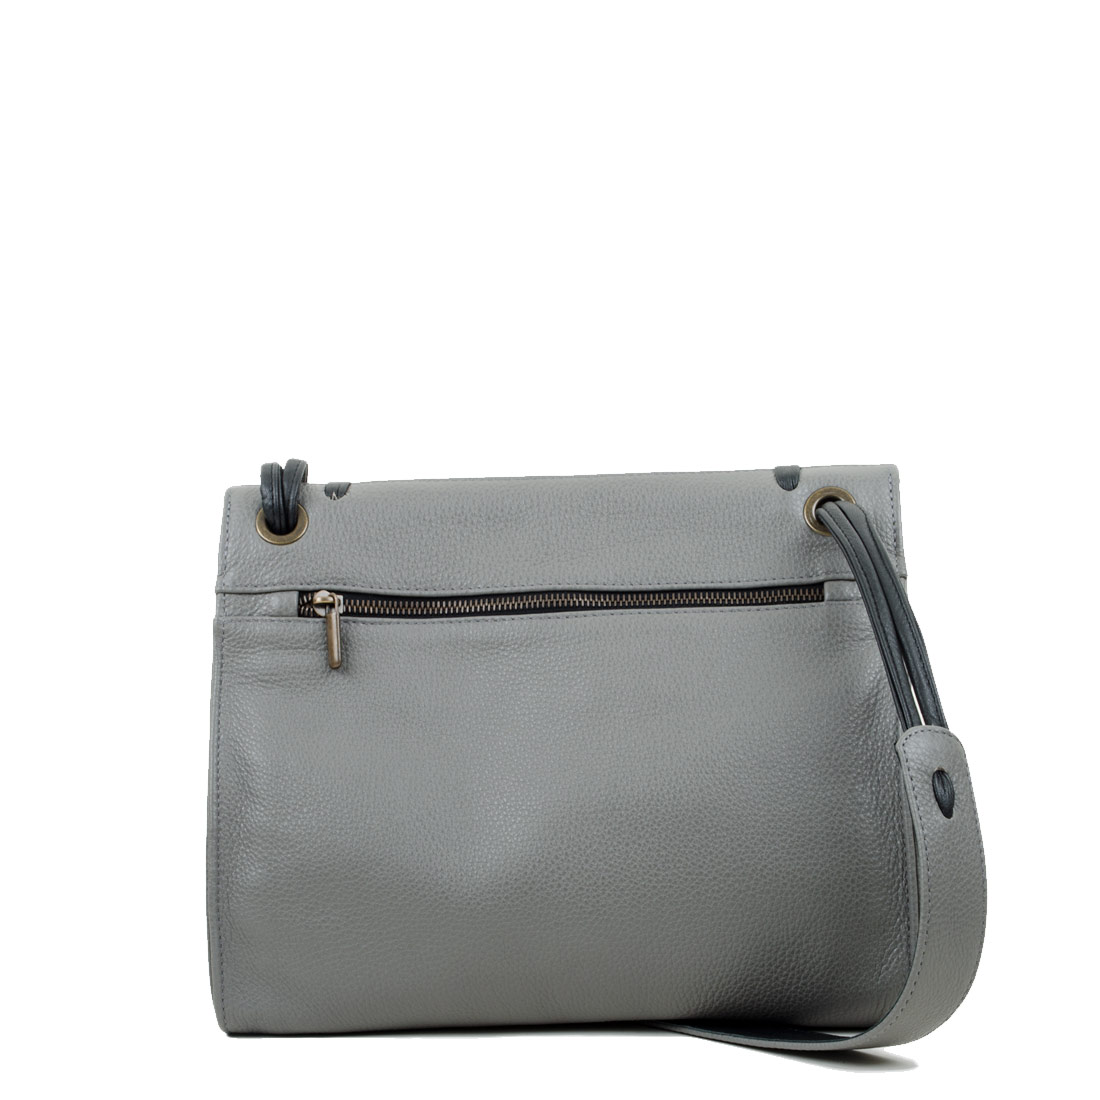 Elsa Grey Leather Across Body Bag